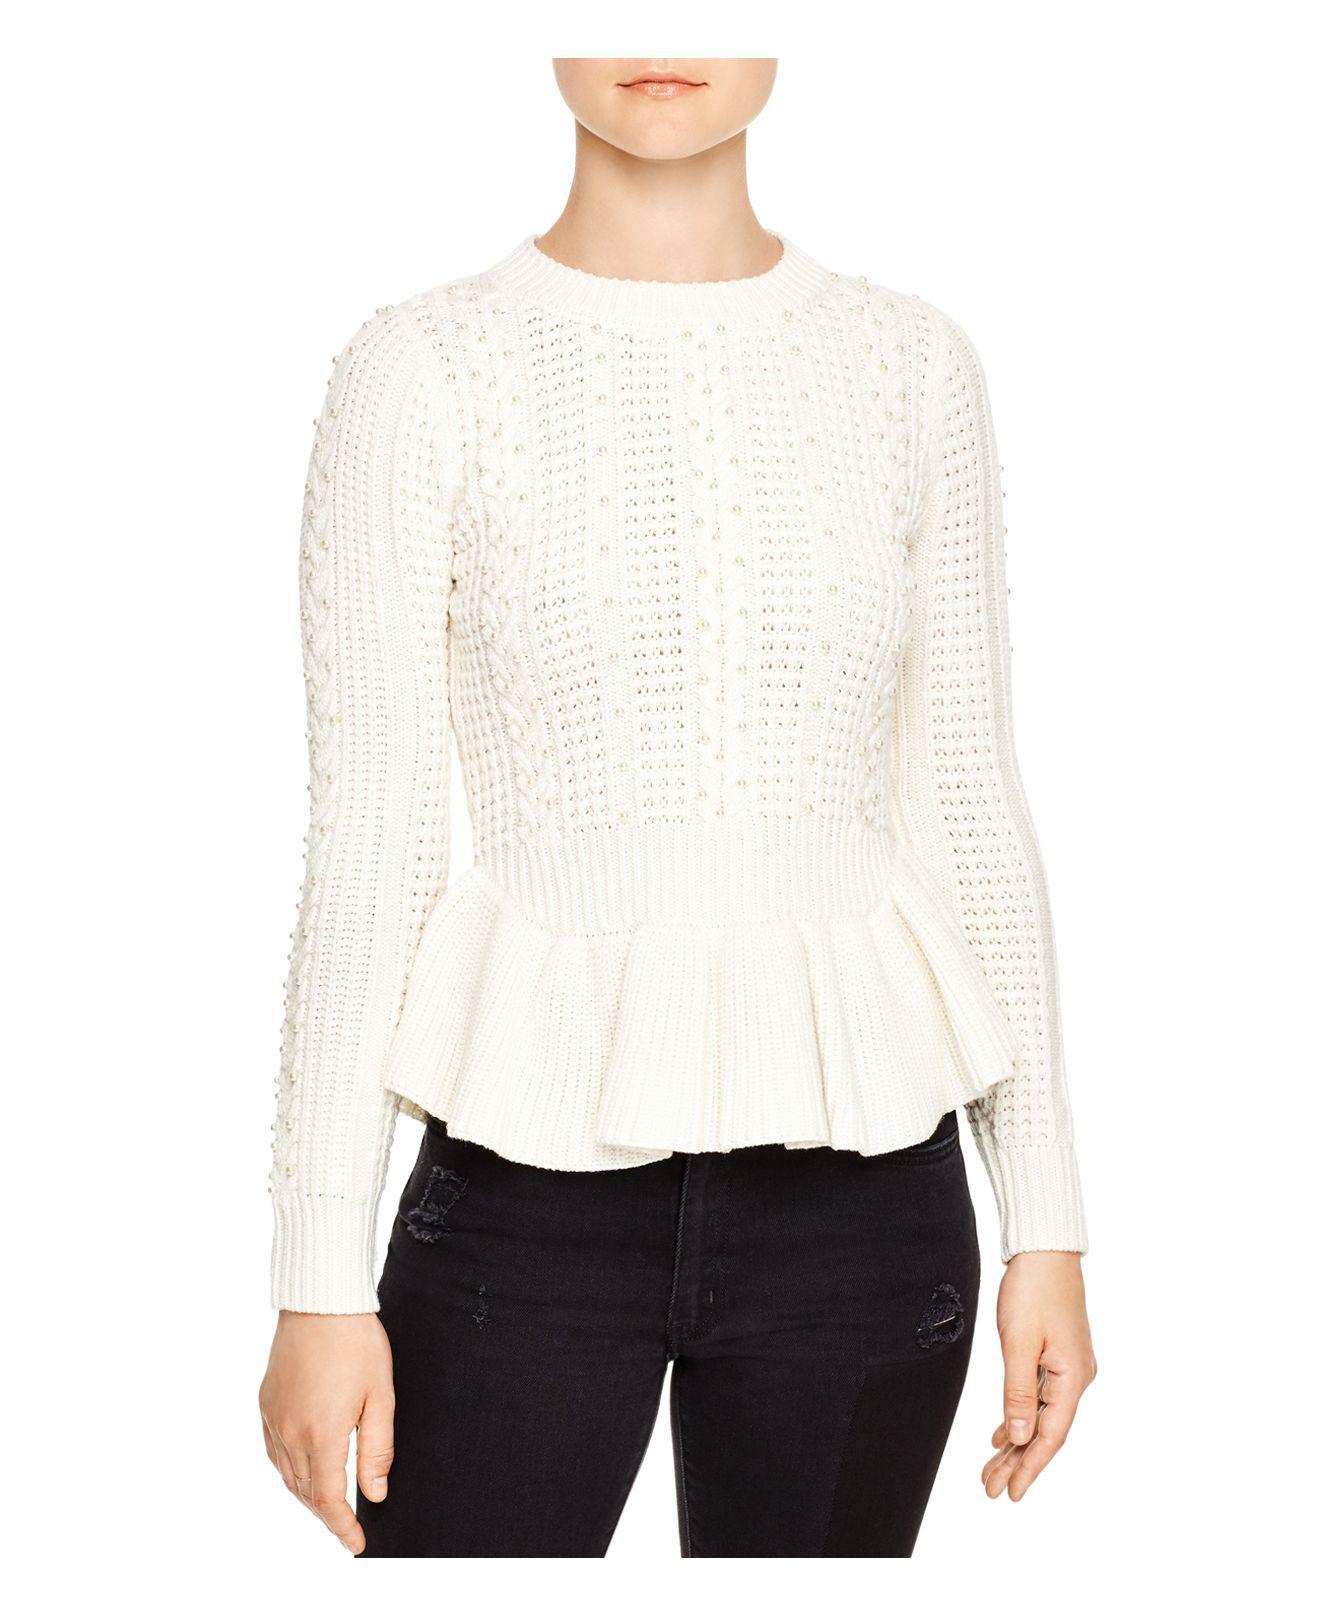 Sandro Rickie Beaded Sweater in White | Lyst